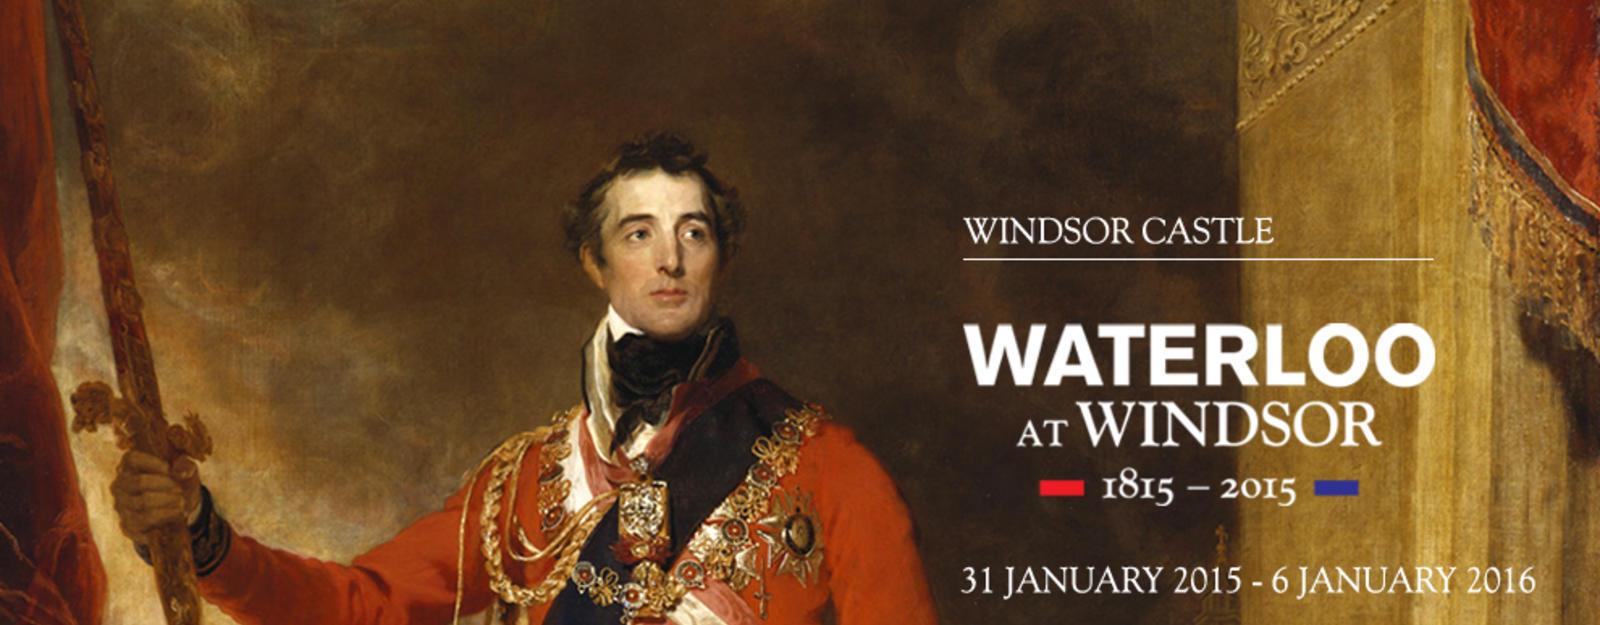 Waterloo at Windsor at Windsor Castle until 6 January 2016